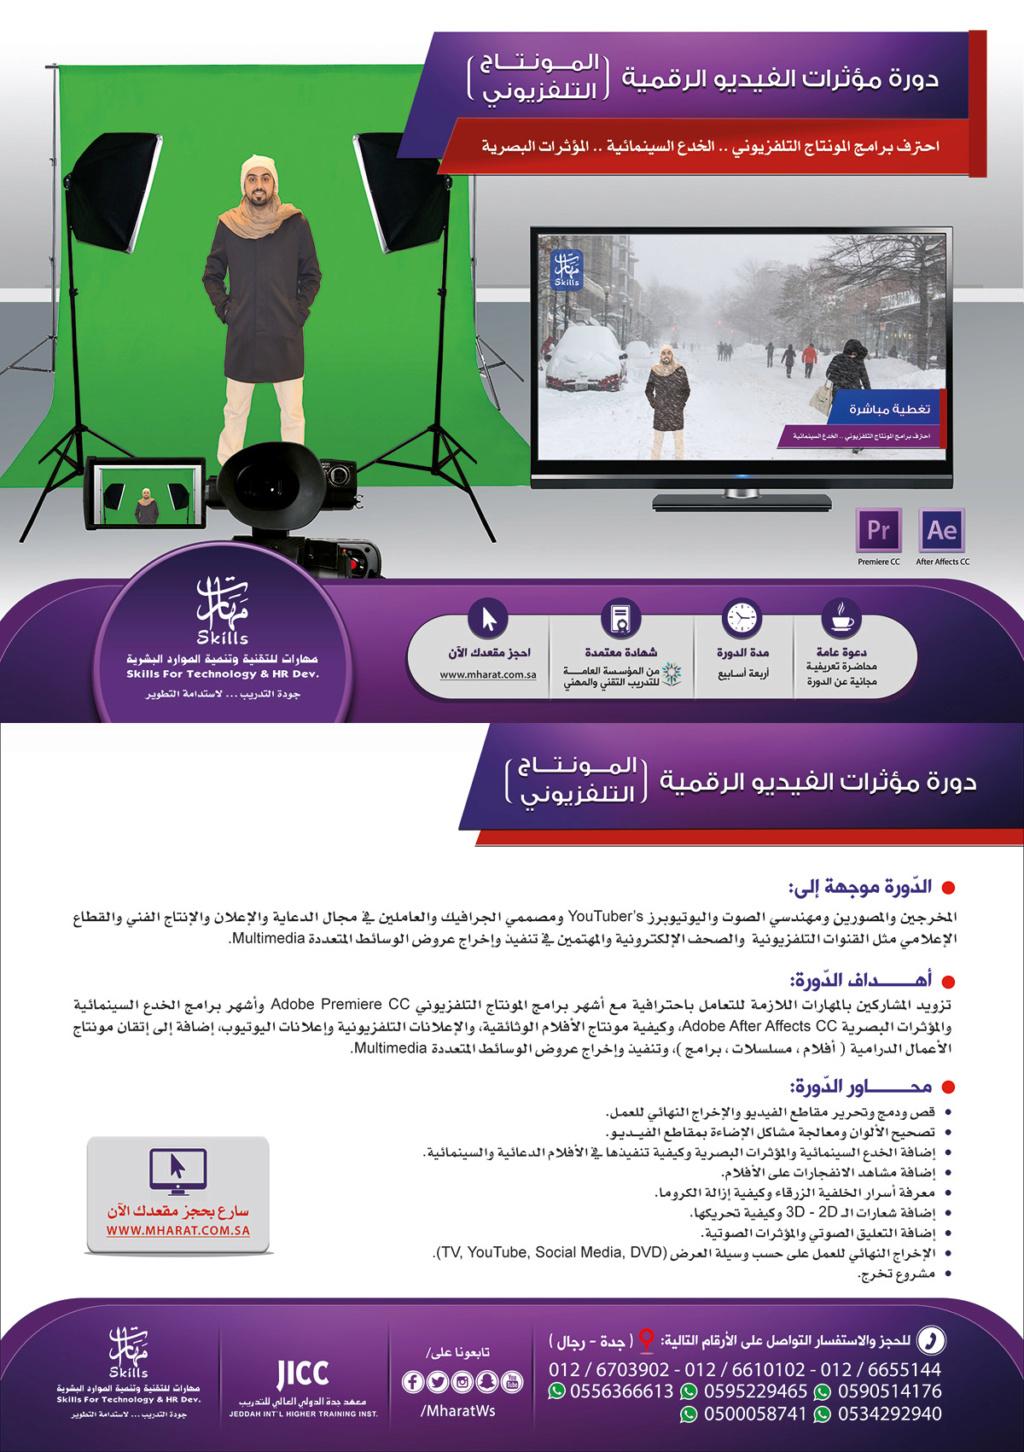 2f81c72dd فرص عمل للسعوديين والسعوديات فقط هل تبحث او تبحثي عن وظيفة سجل/ي بيانتك في  الرابط التالي https://goo.gl/forms/digW5PNZ8B0h46ie2